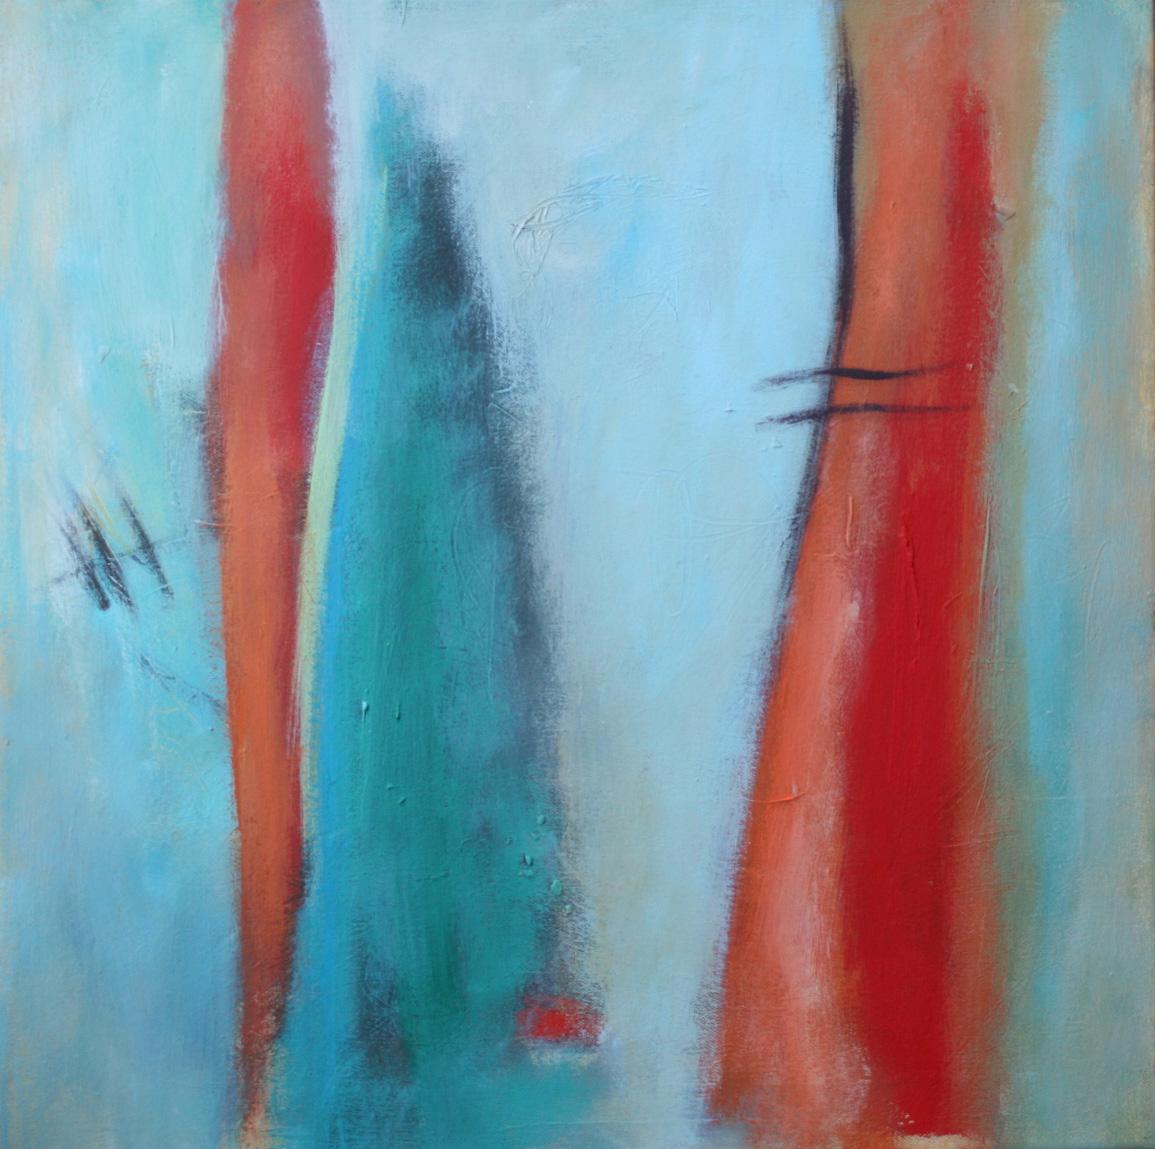 Im Nebel, Öl und Acryl auf Leinwand, 50 x 50 cm